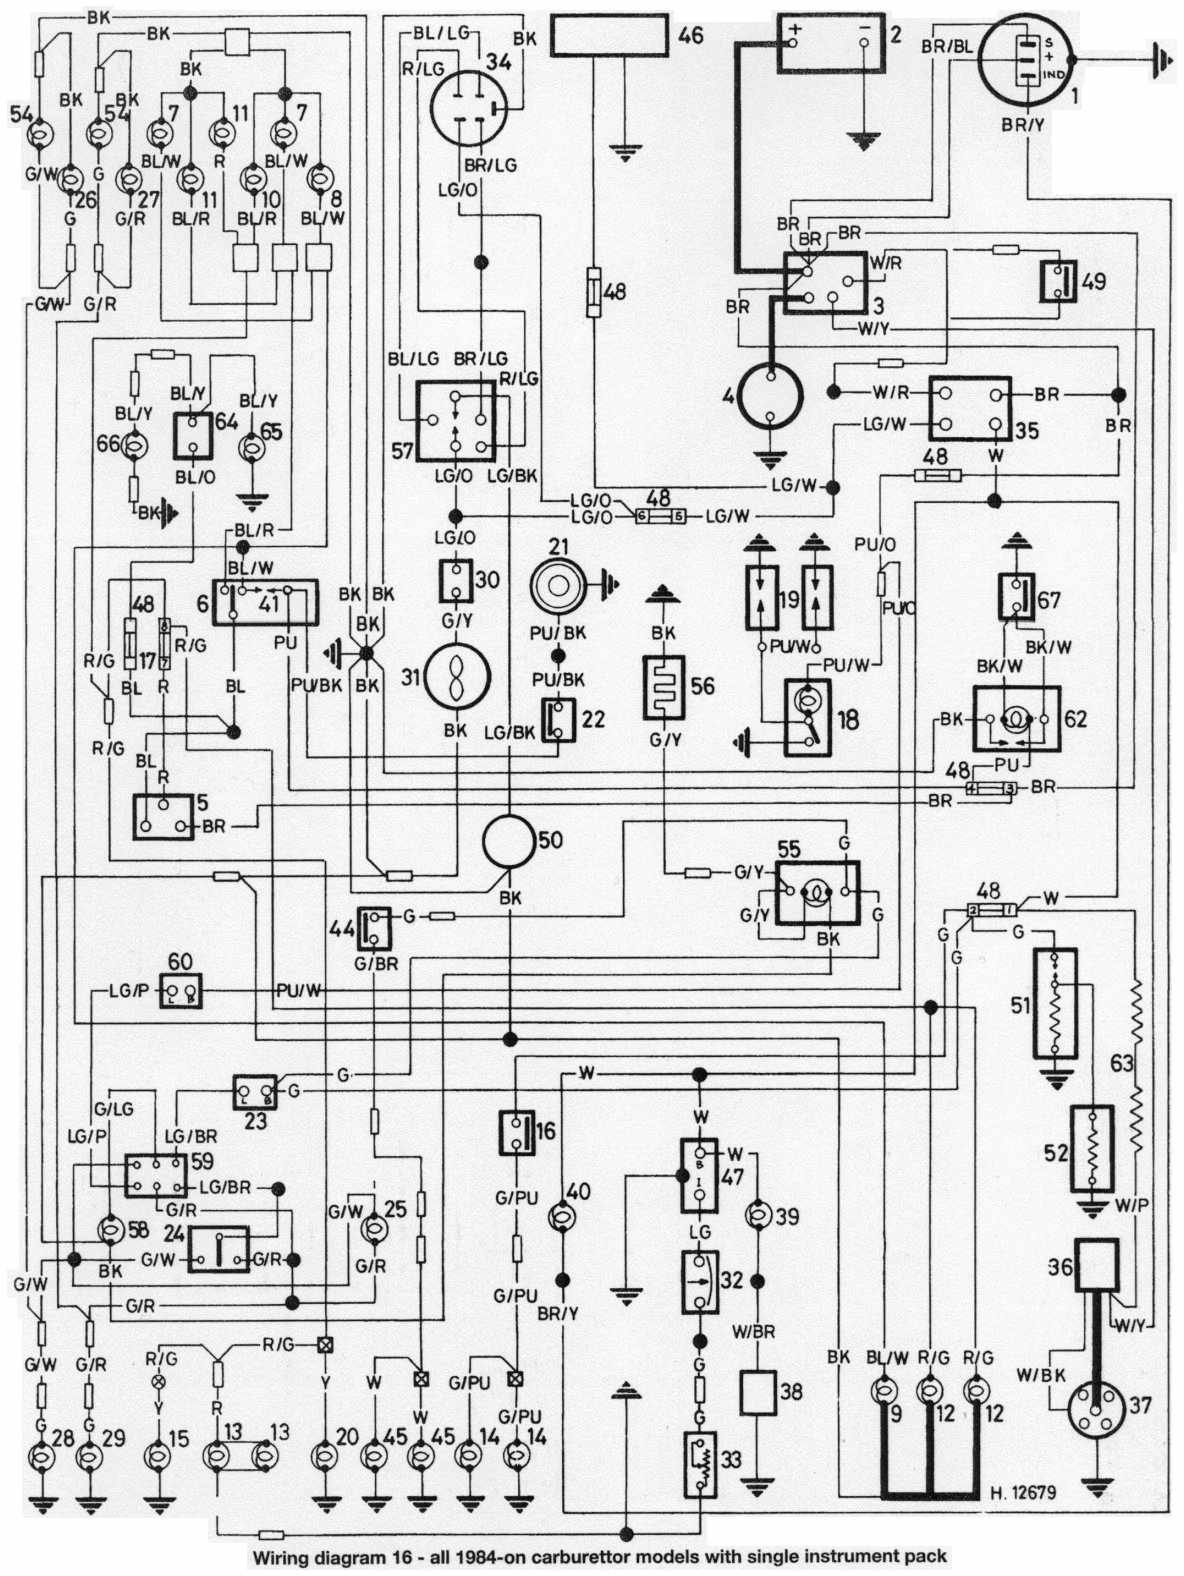 X Mini Circuit Diagram Wiring Diagrams Schema Simple Logic